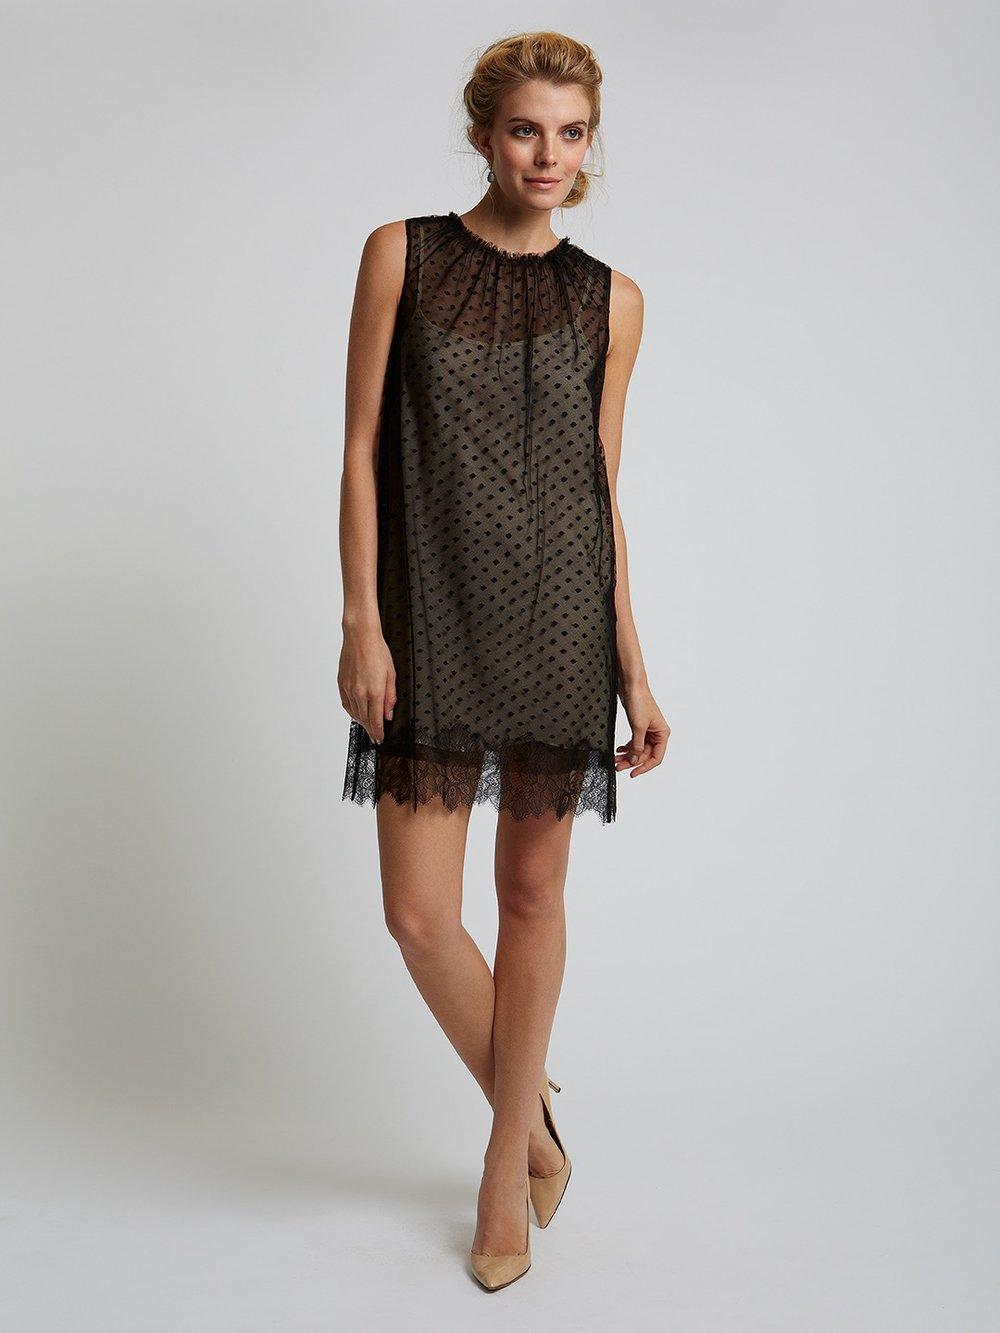 ALICIA DRESS.jpg